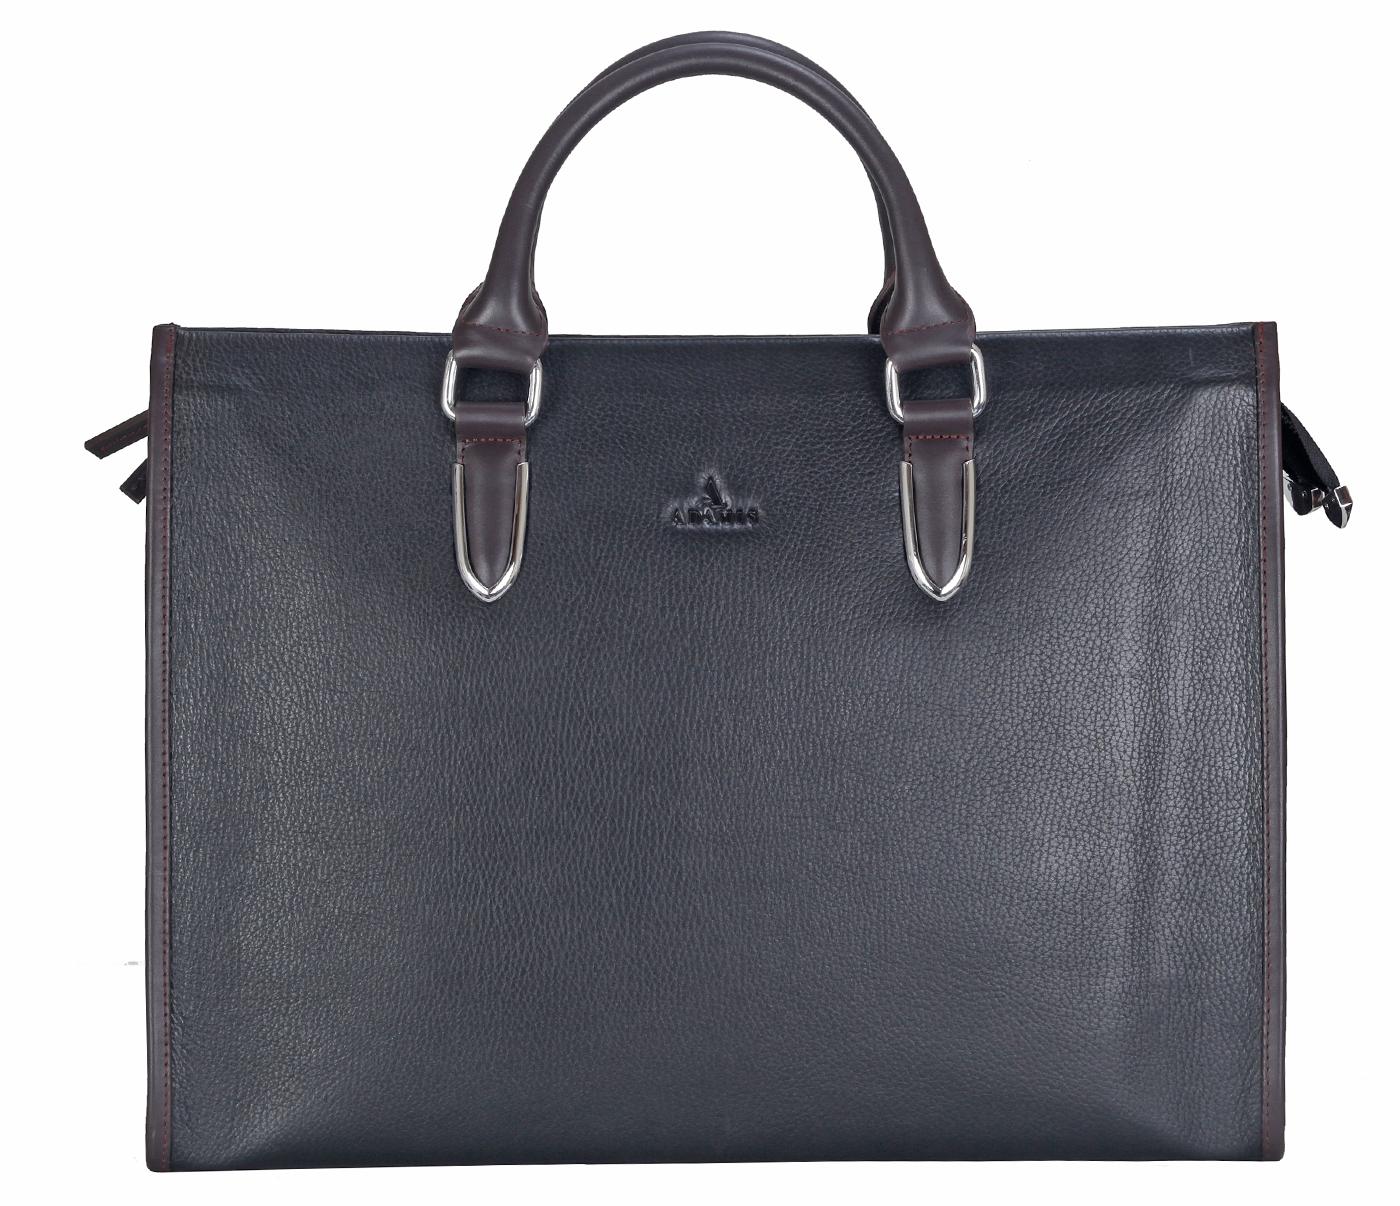 F57-Maxwell-Laptop cum portfolio messenger bag in Genuine Leather - Black/Brown